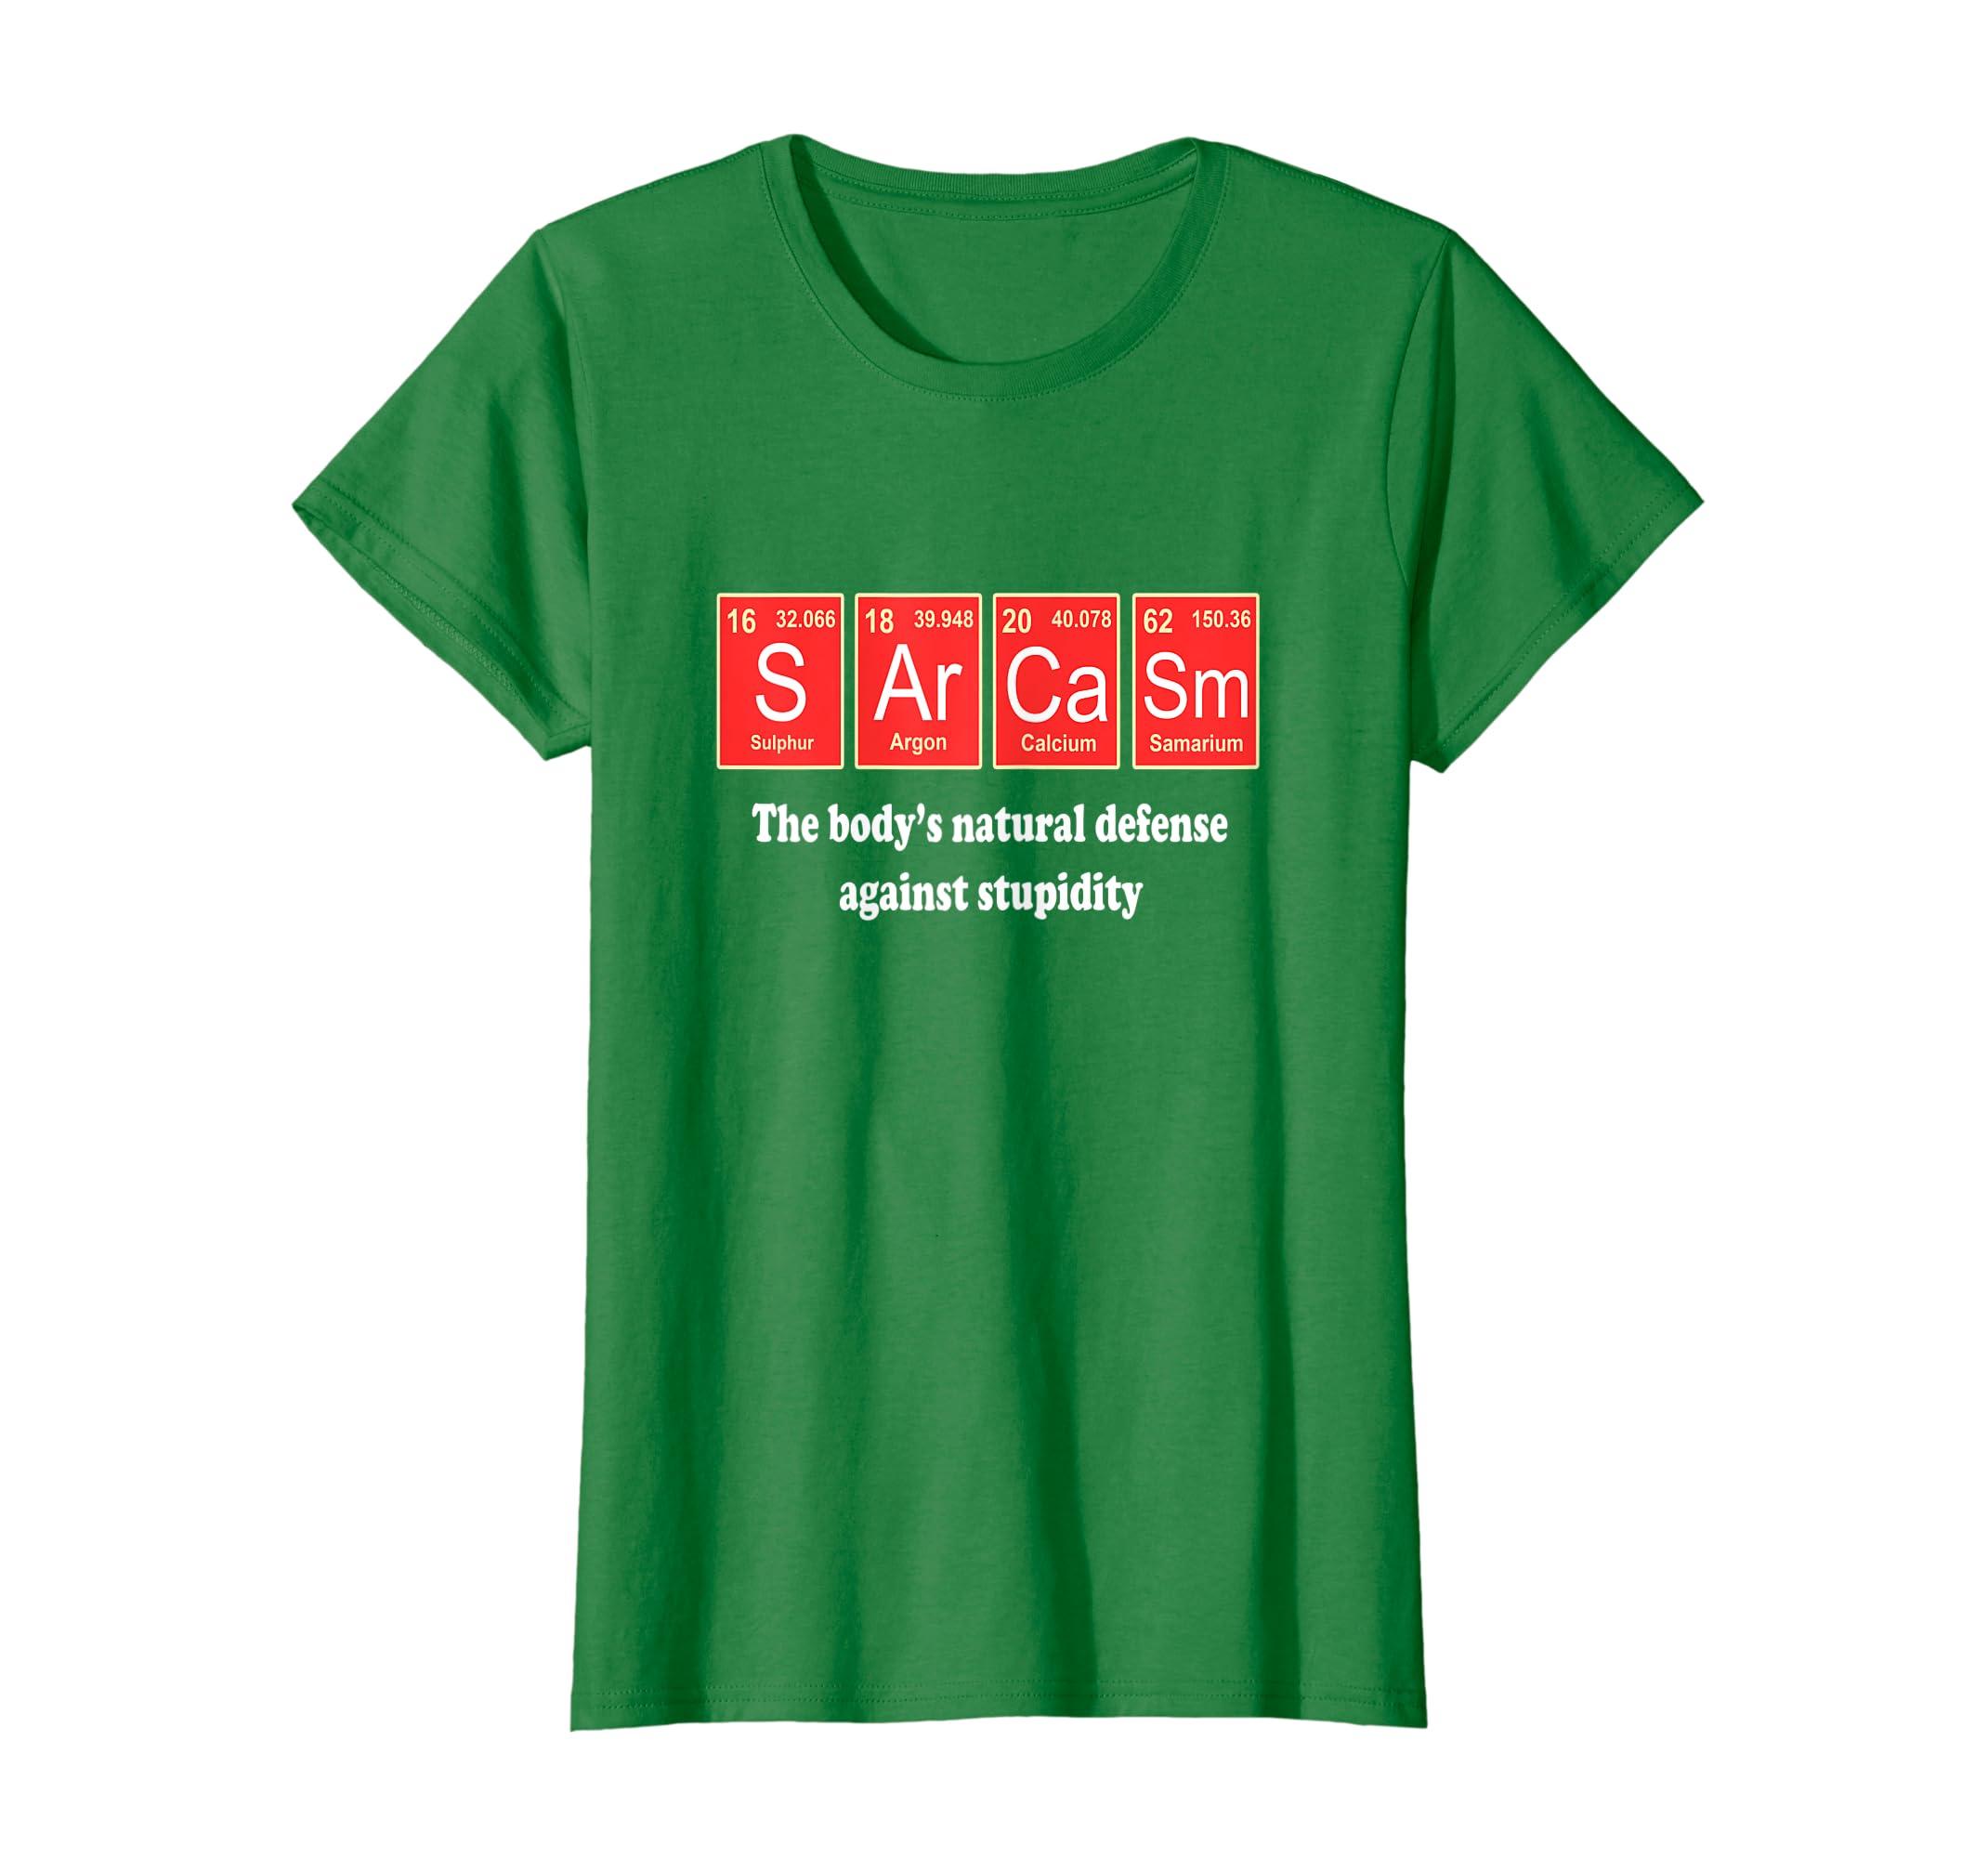 939b4c282 Amazon.com: Sarcasm The Body's Natural Defense Against Stupidity T-Shirt:  Clothing